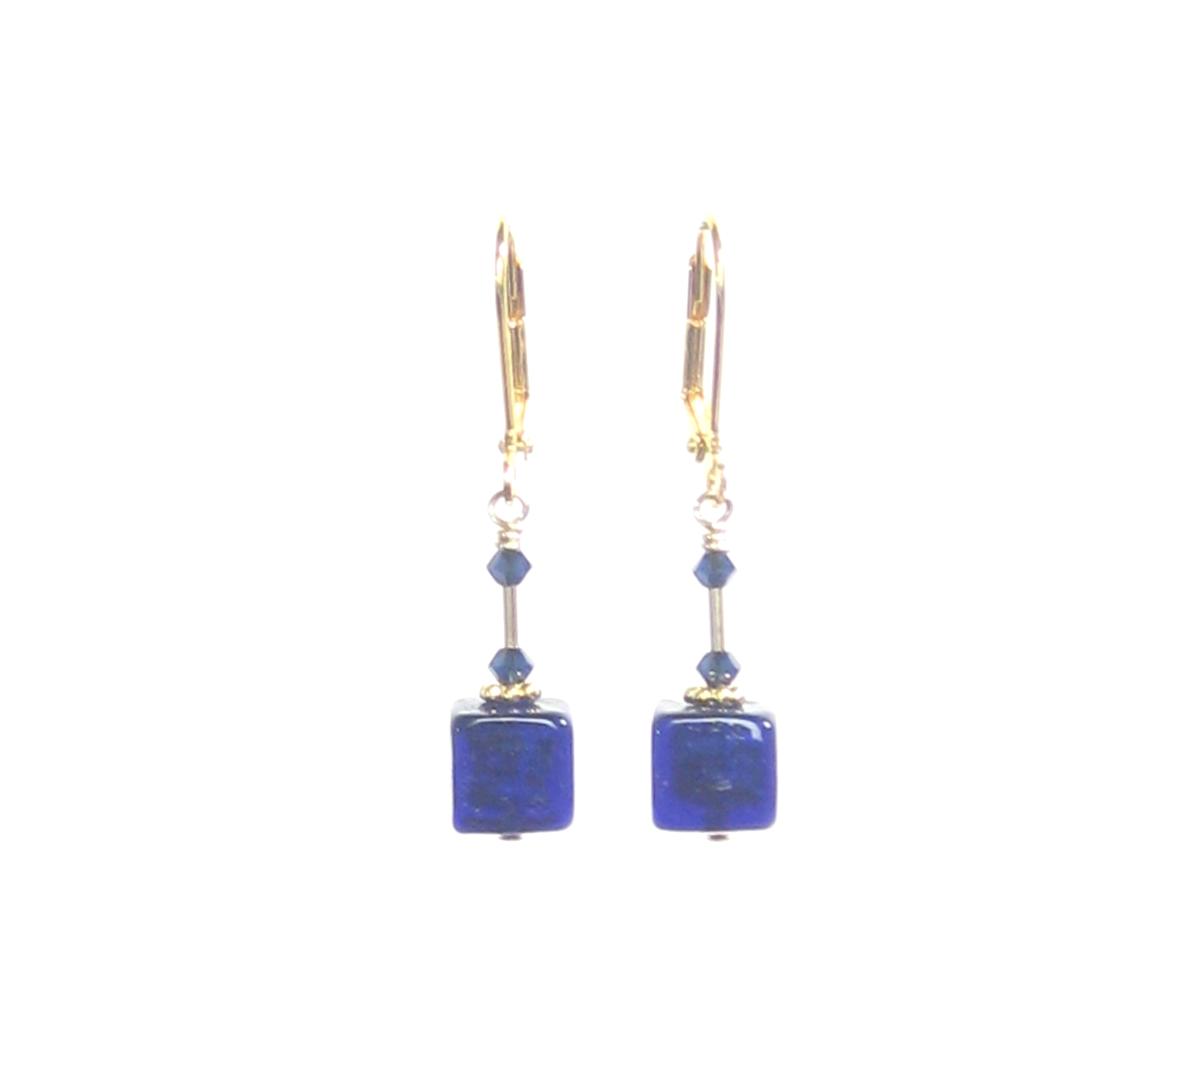 Murano Glass Cobalt Blue Cube Gold Earrings https://bit.ly/2pfaHE6 #earrings #murano #jewelry #handmade #fashion #etsymntt pic.twitter.com/2WRl7o2xG9